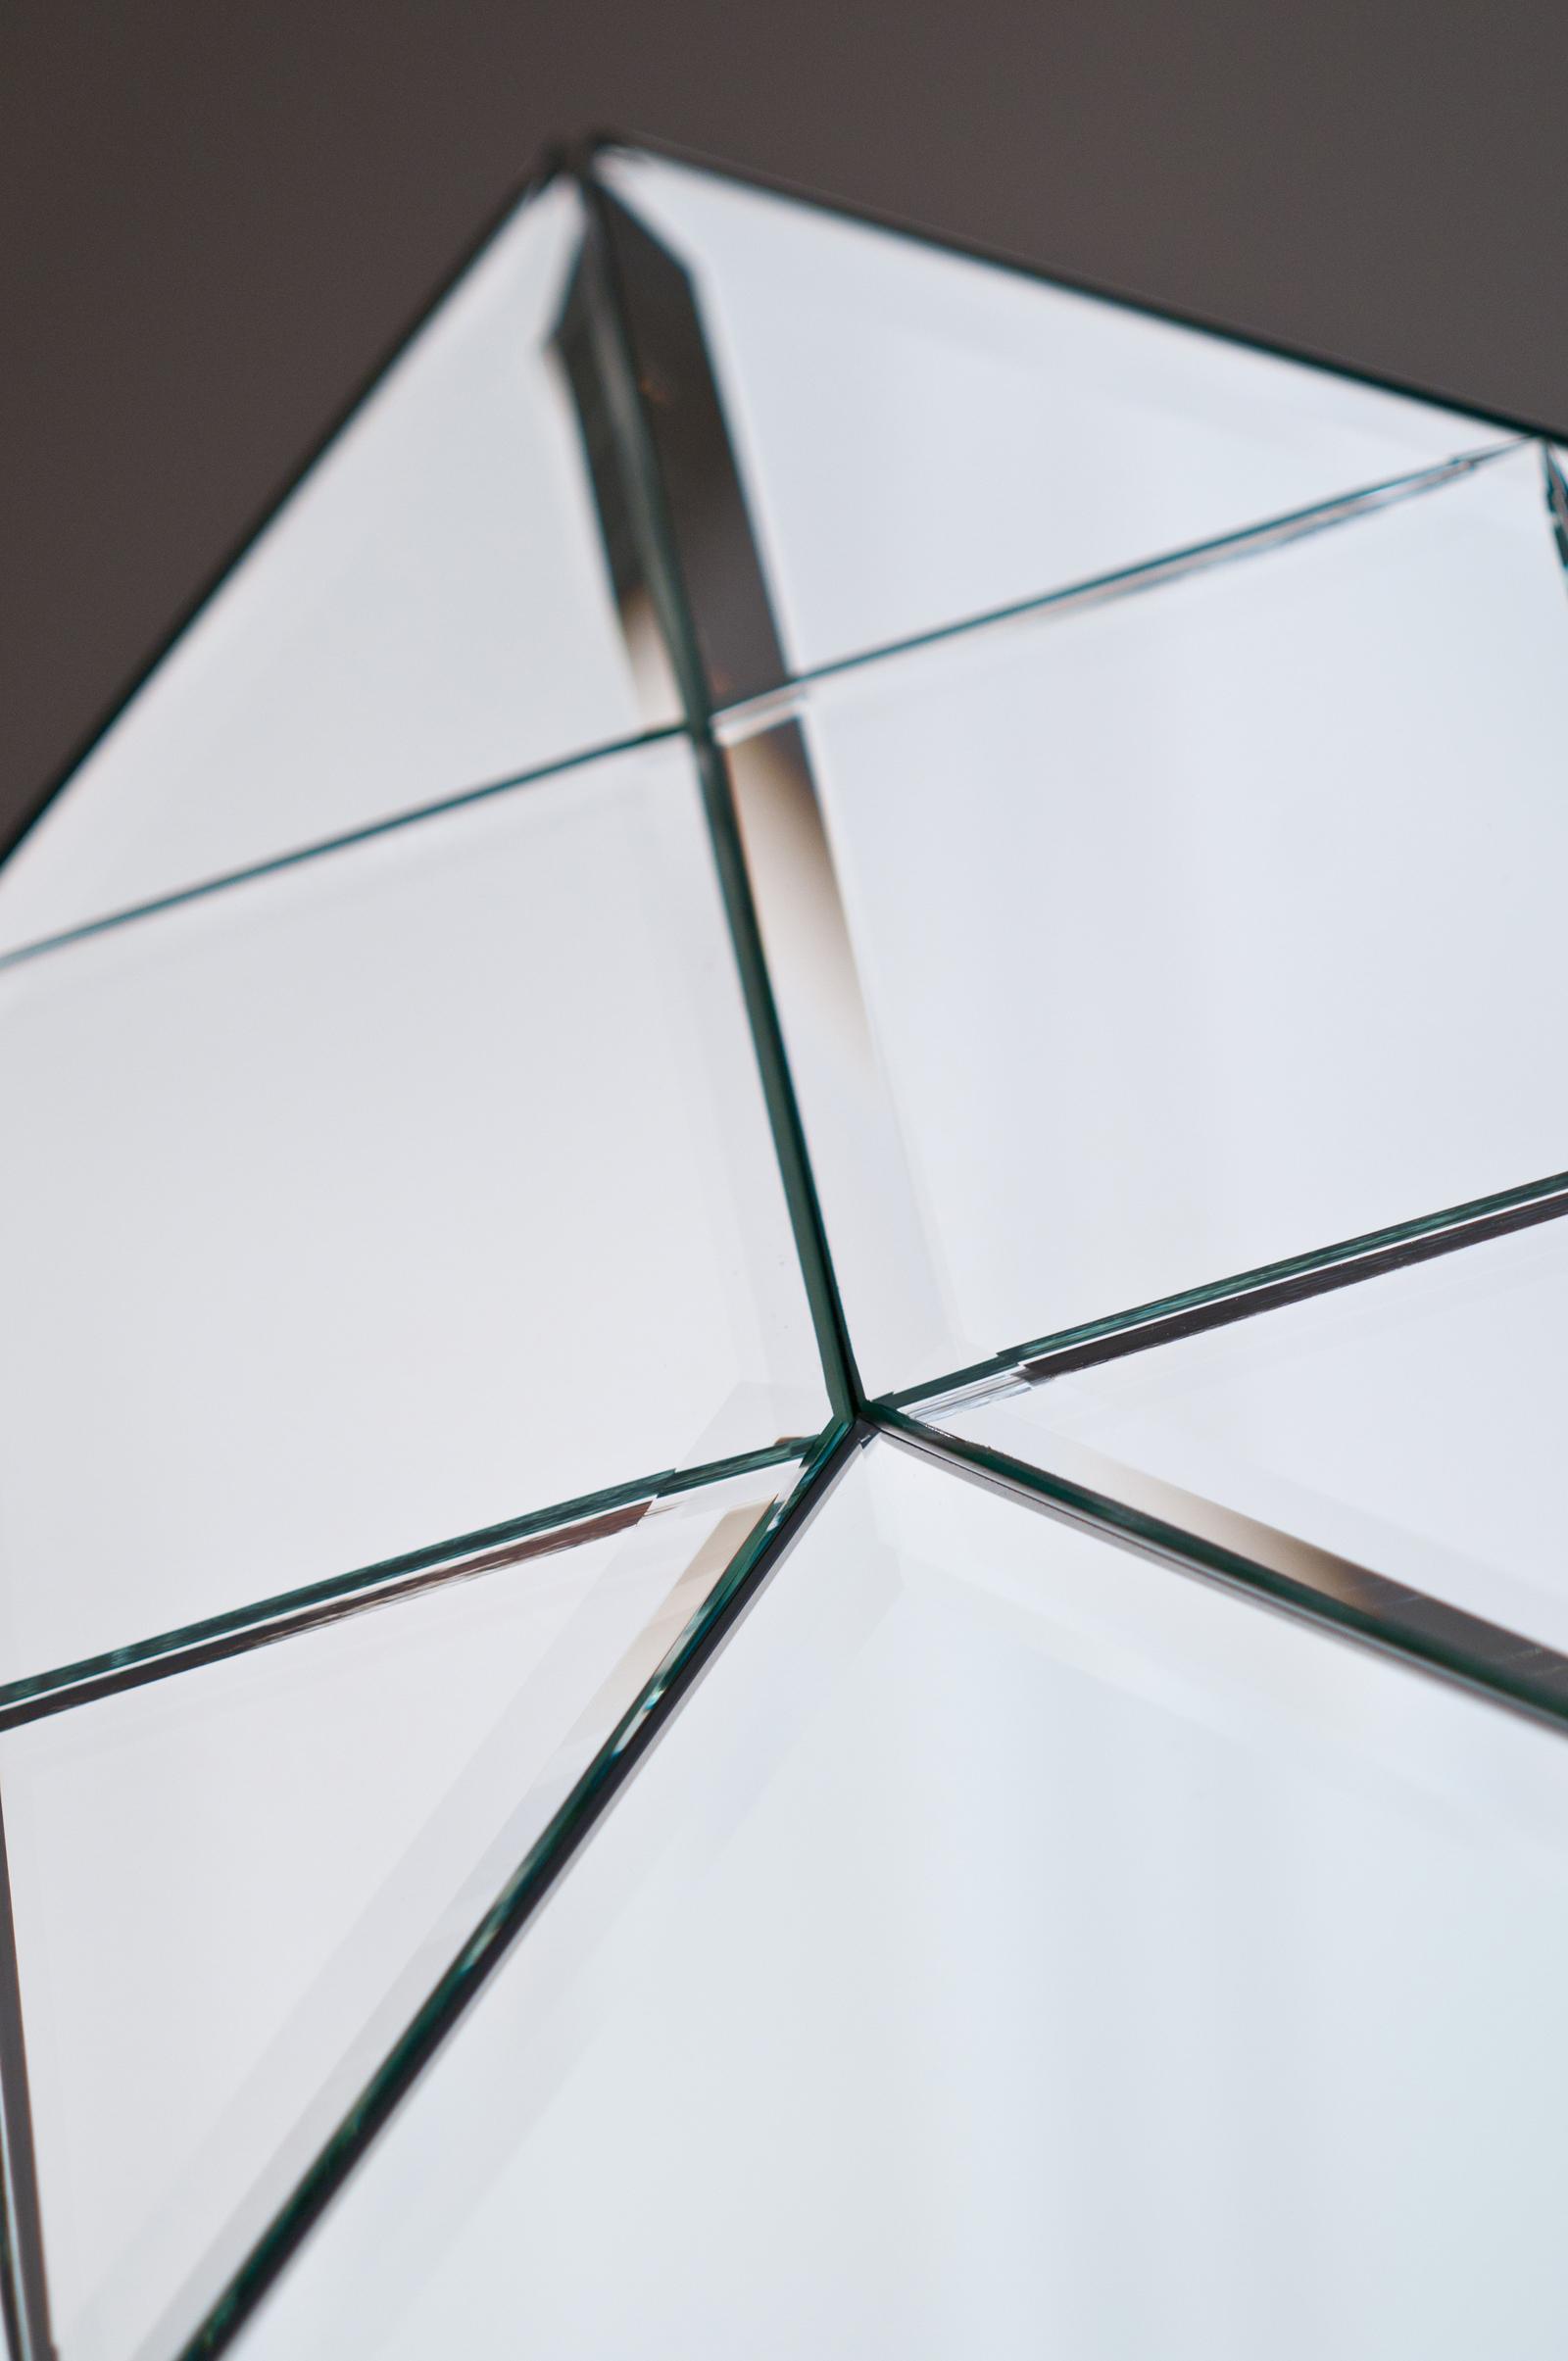 Illusion-miroir-mirror-veronese-3.jpg